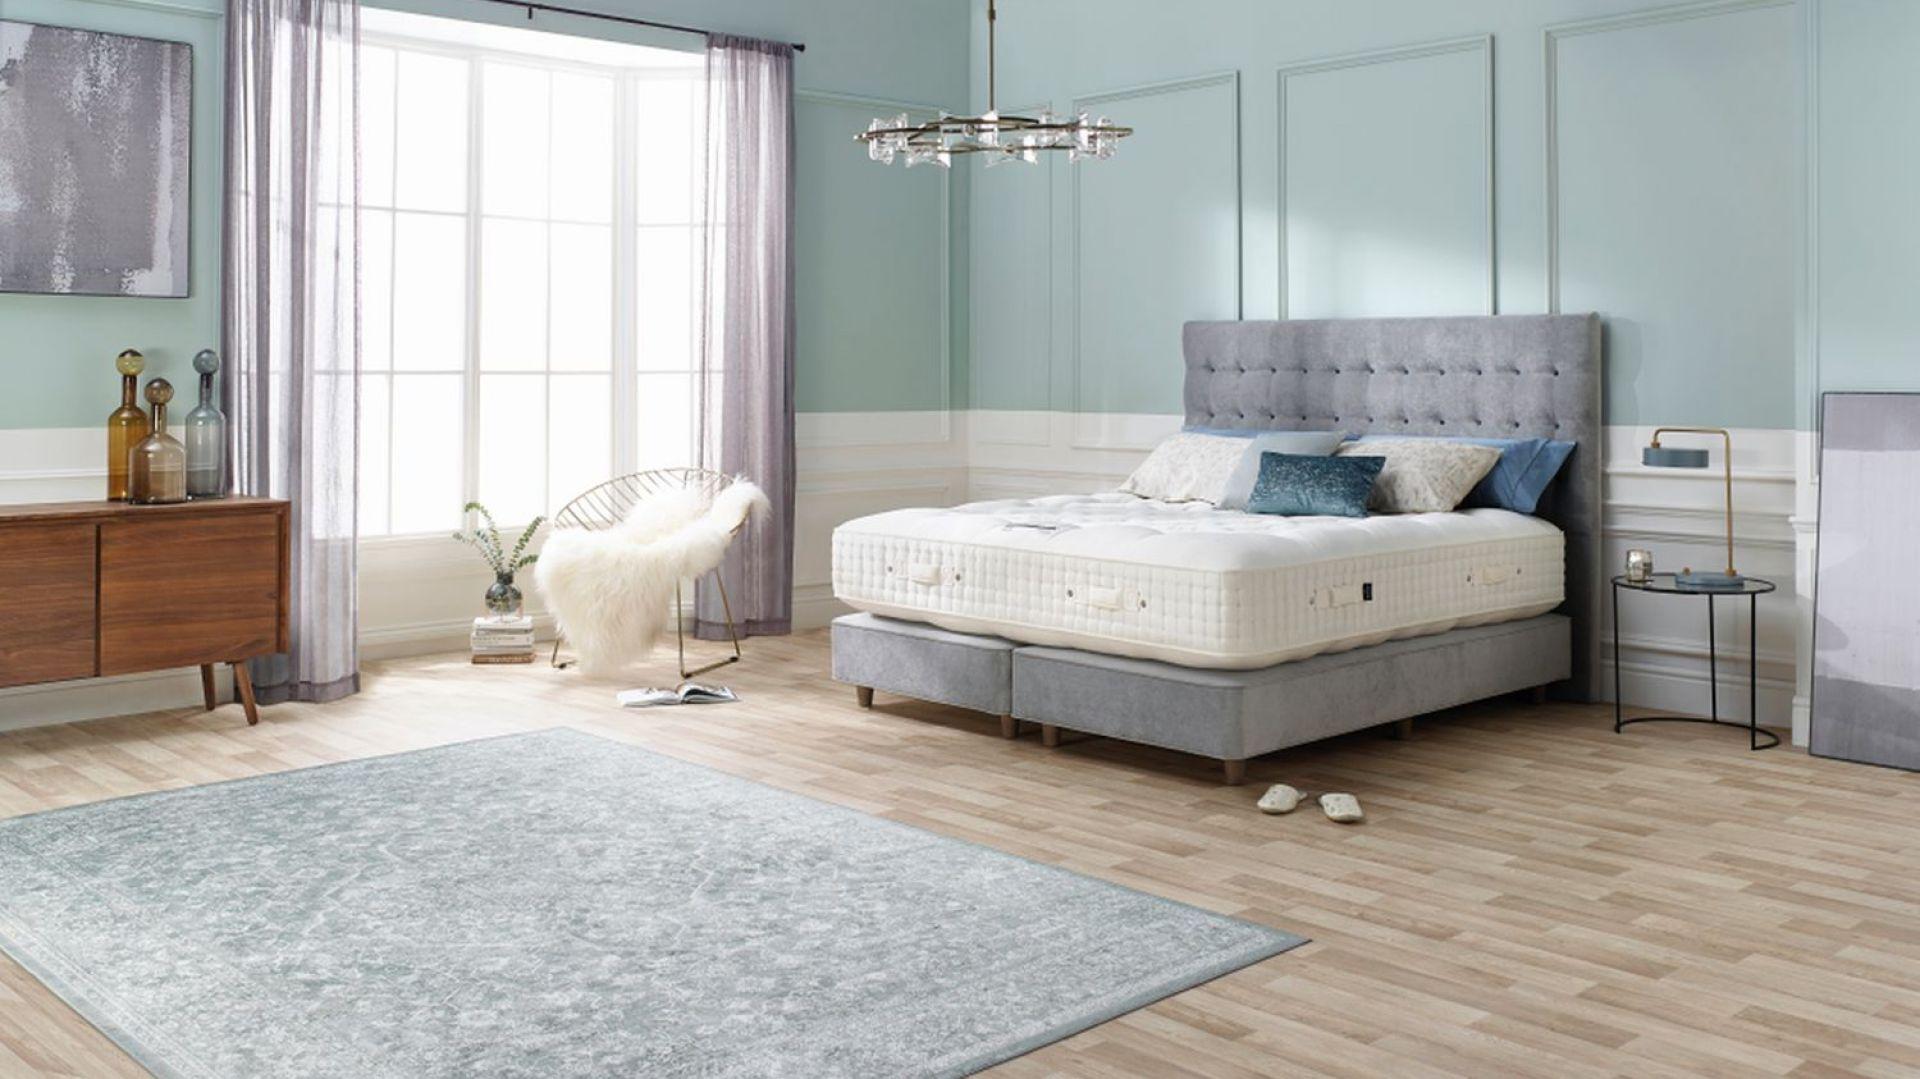 Materac brytyjskiej marki Somnus. Fot. Home and Hotel Solutions